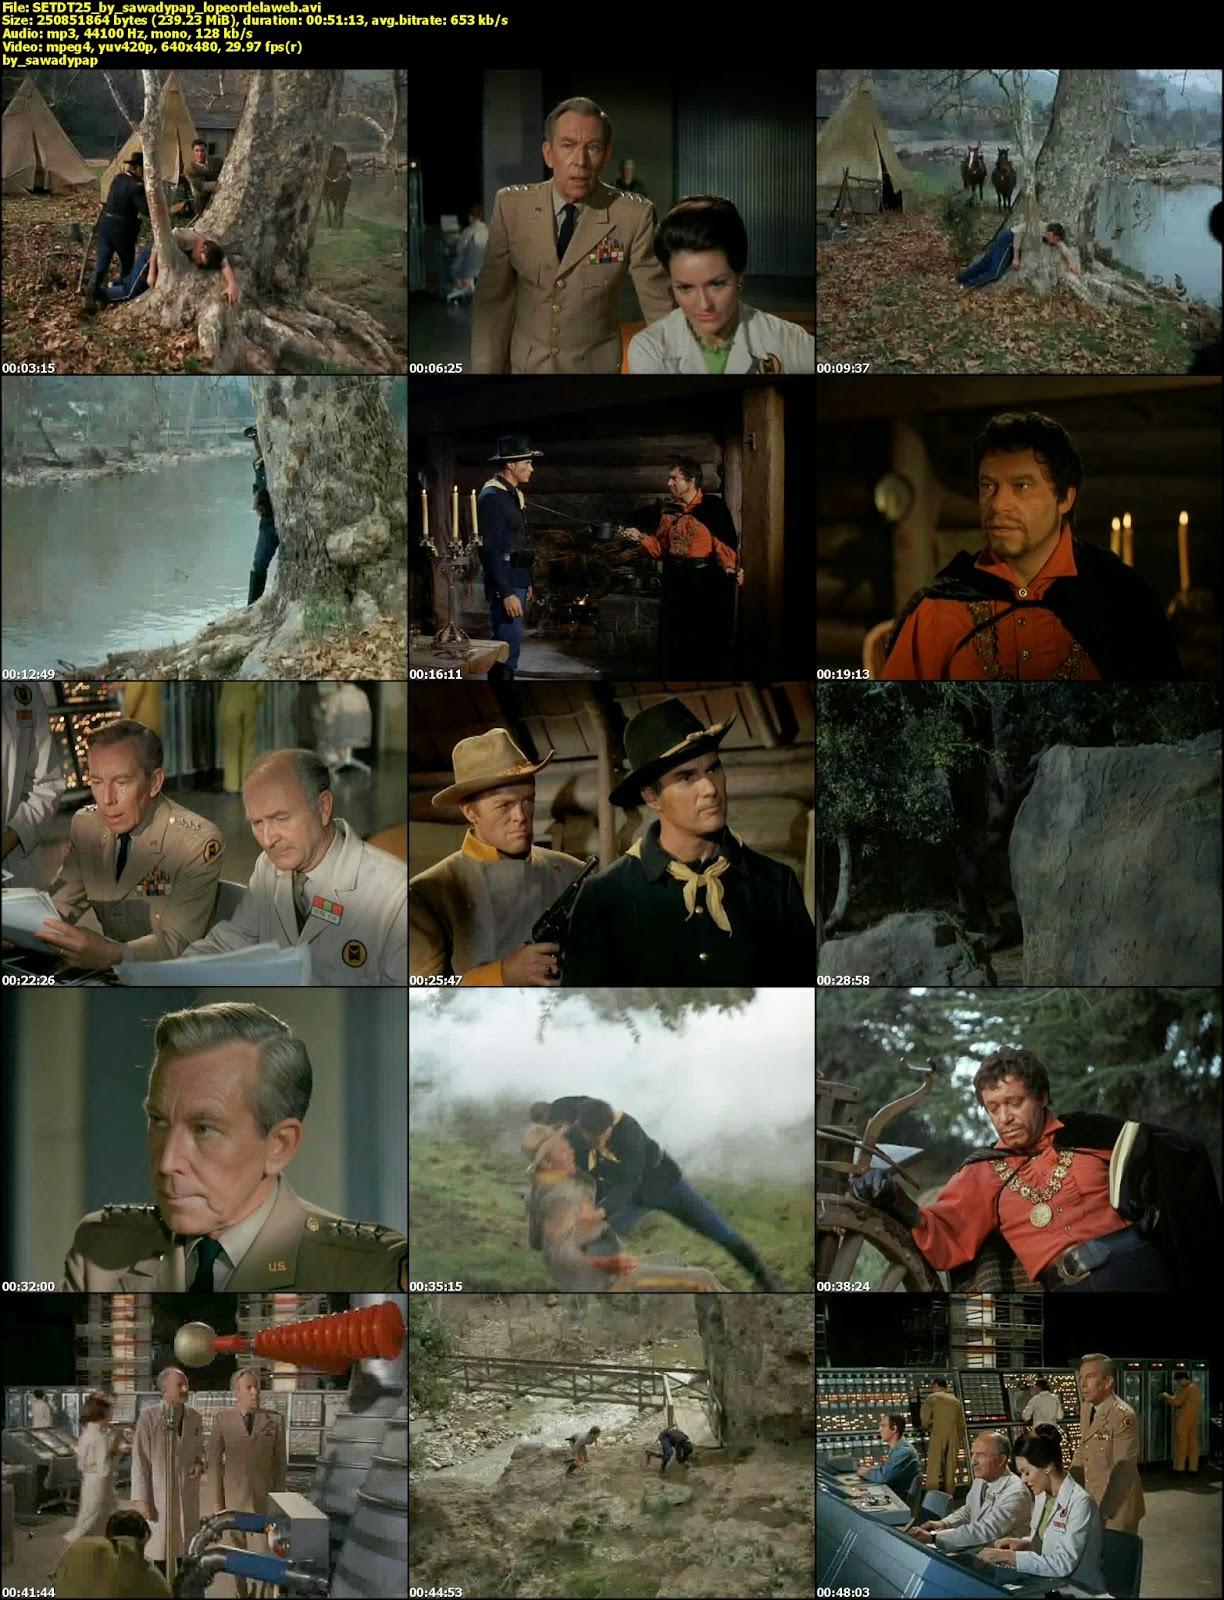 [Serie] El Tunel del Tiempo [1966] [DVDRip] [Latino]